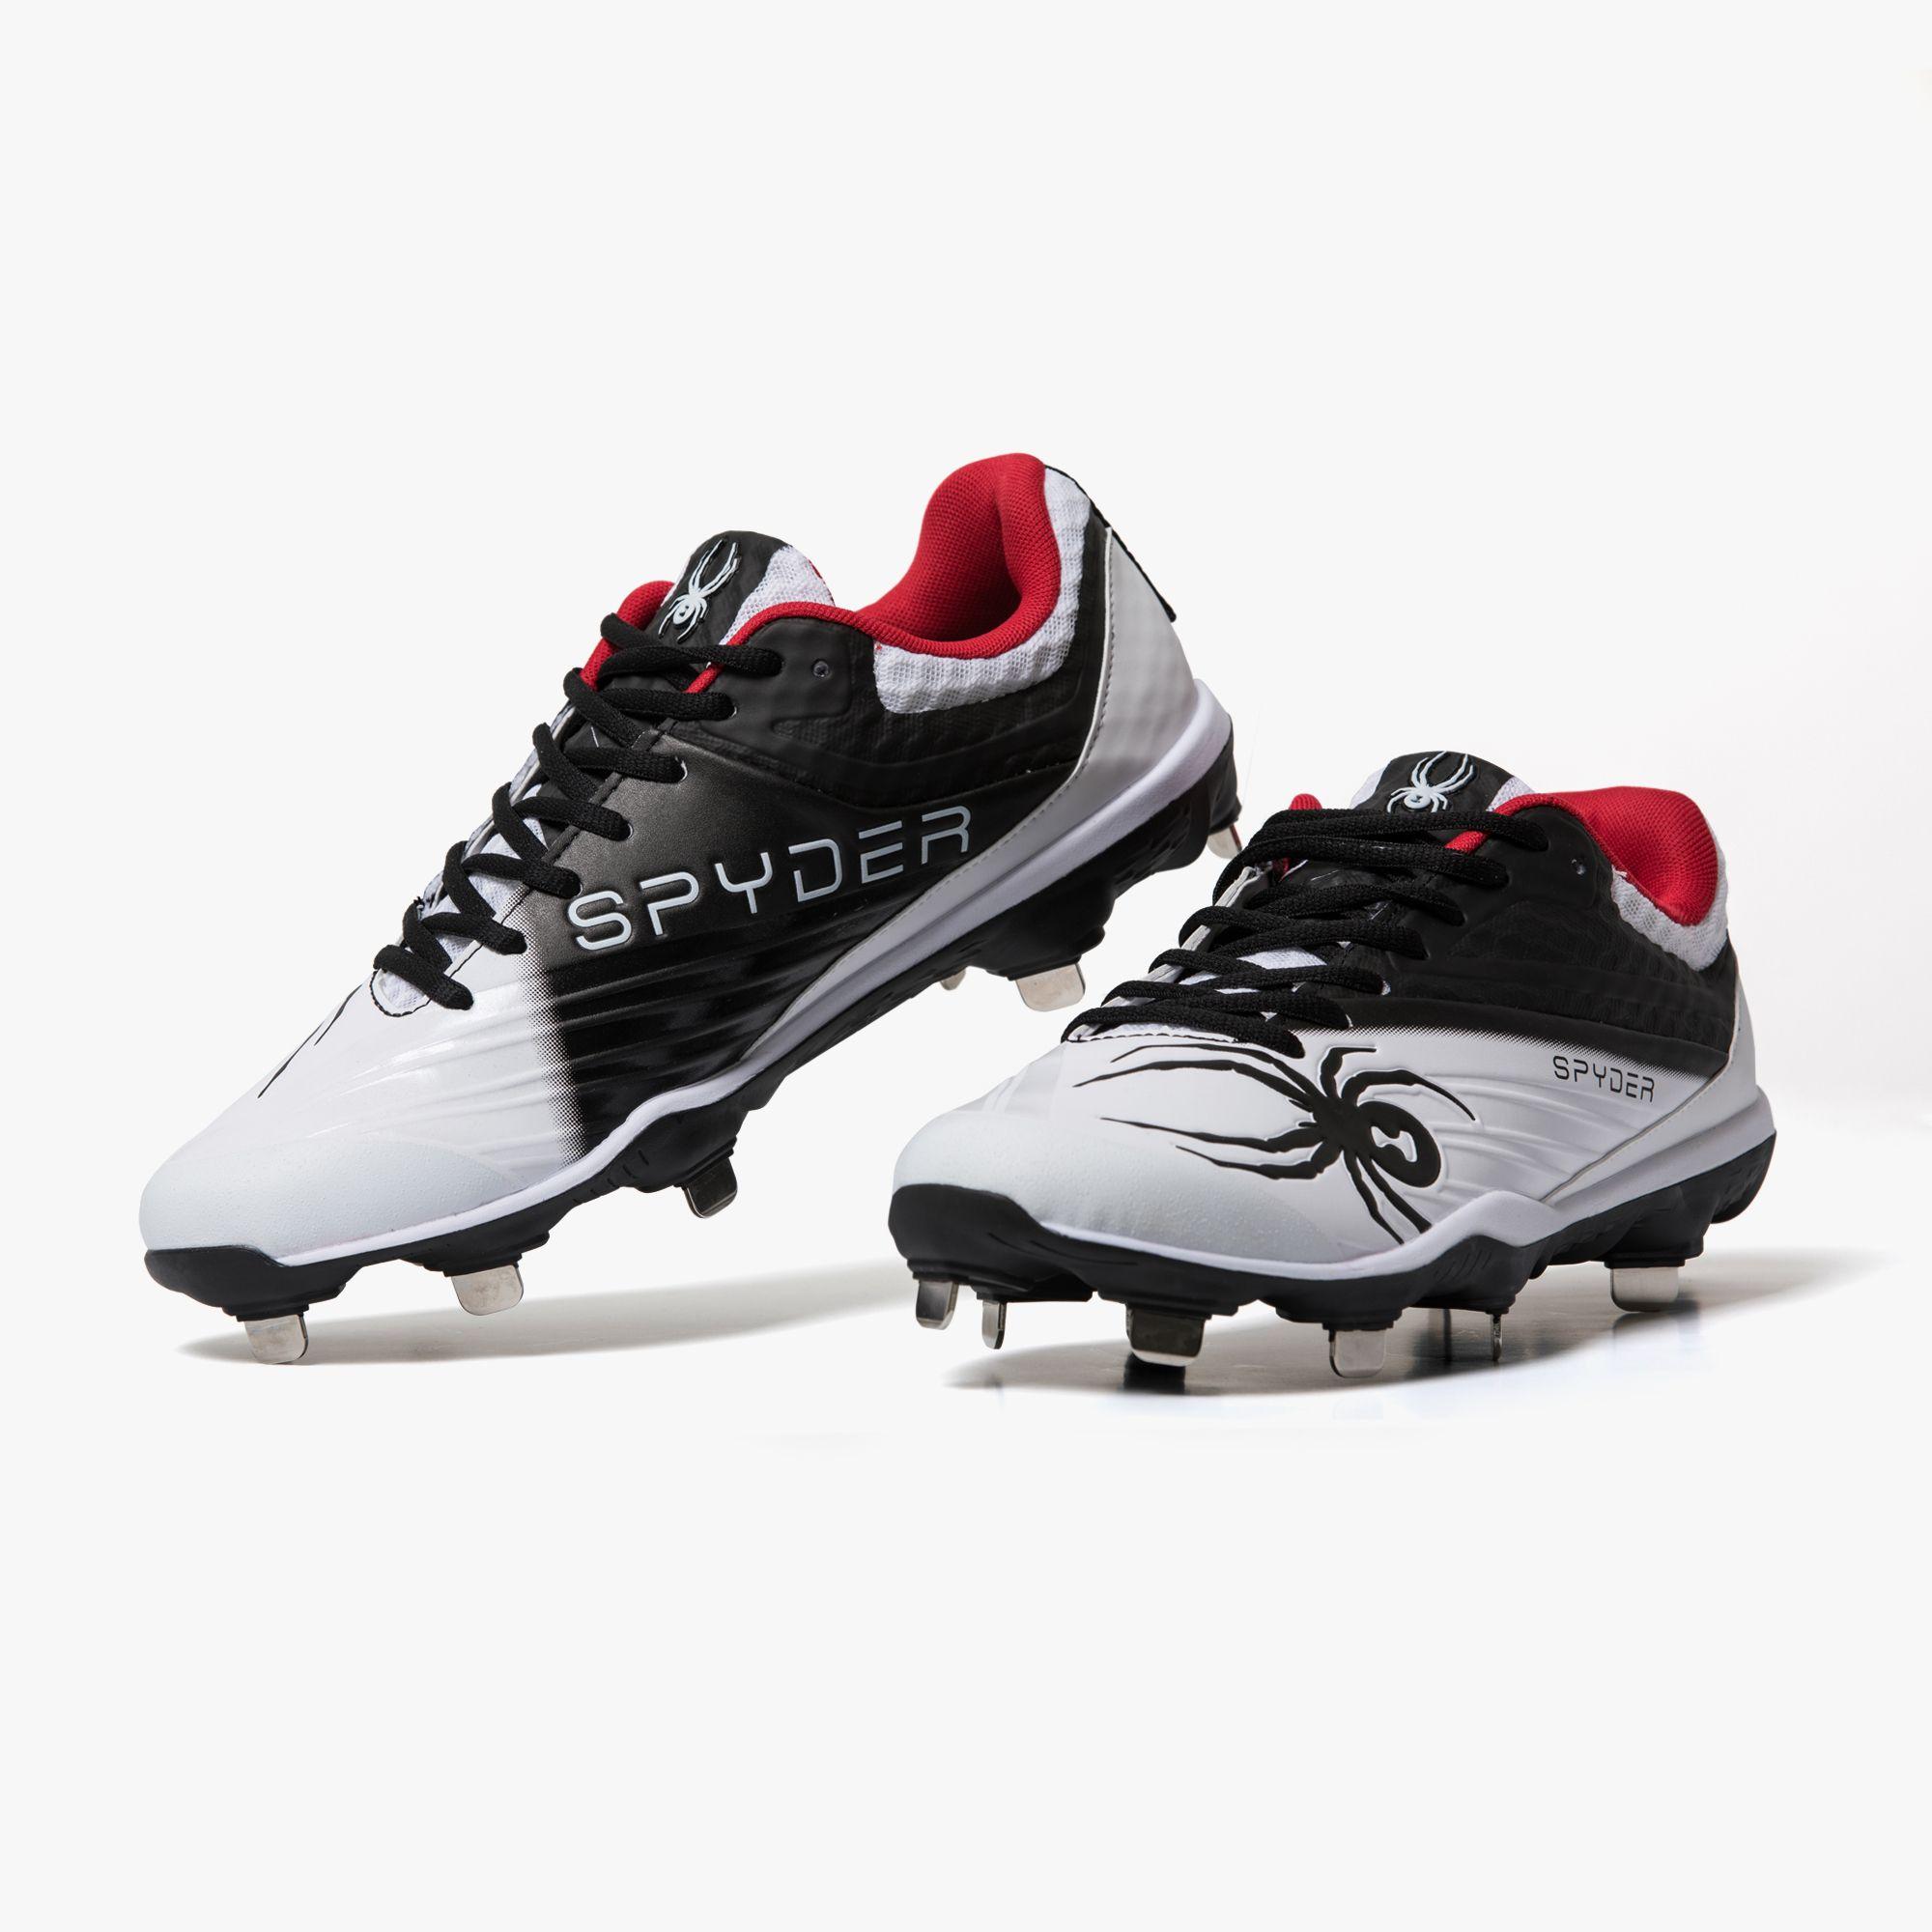 new product 05950 63d07 Botines Adidas F5 TRX FG - Netshoes  shoes which I hv